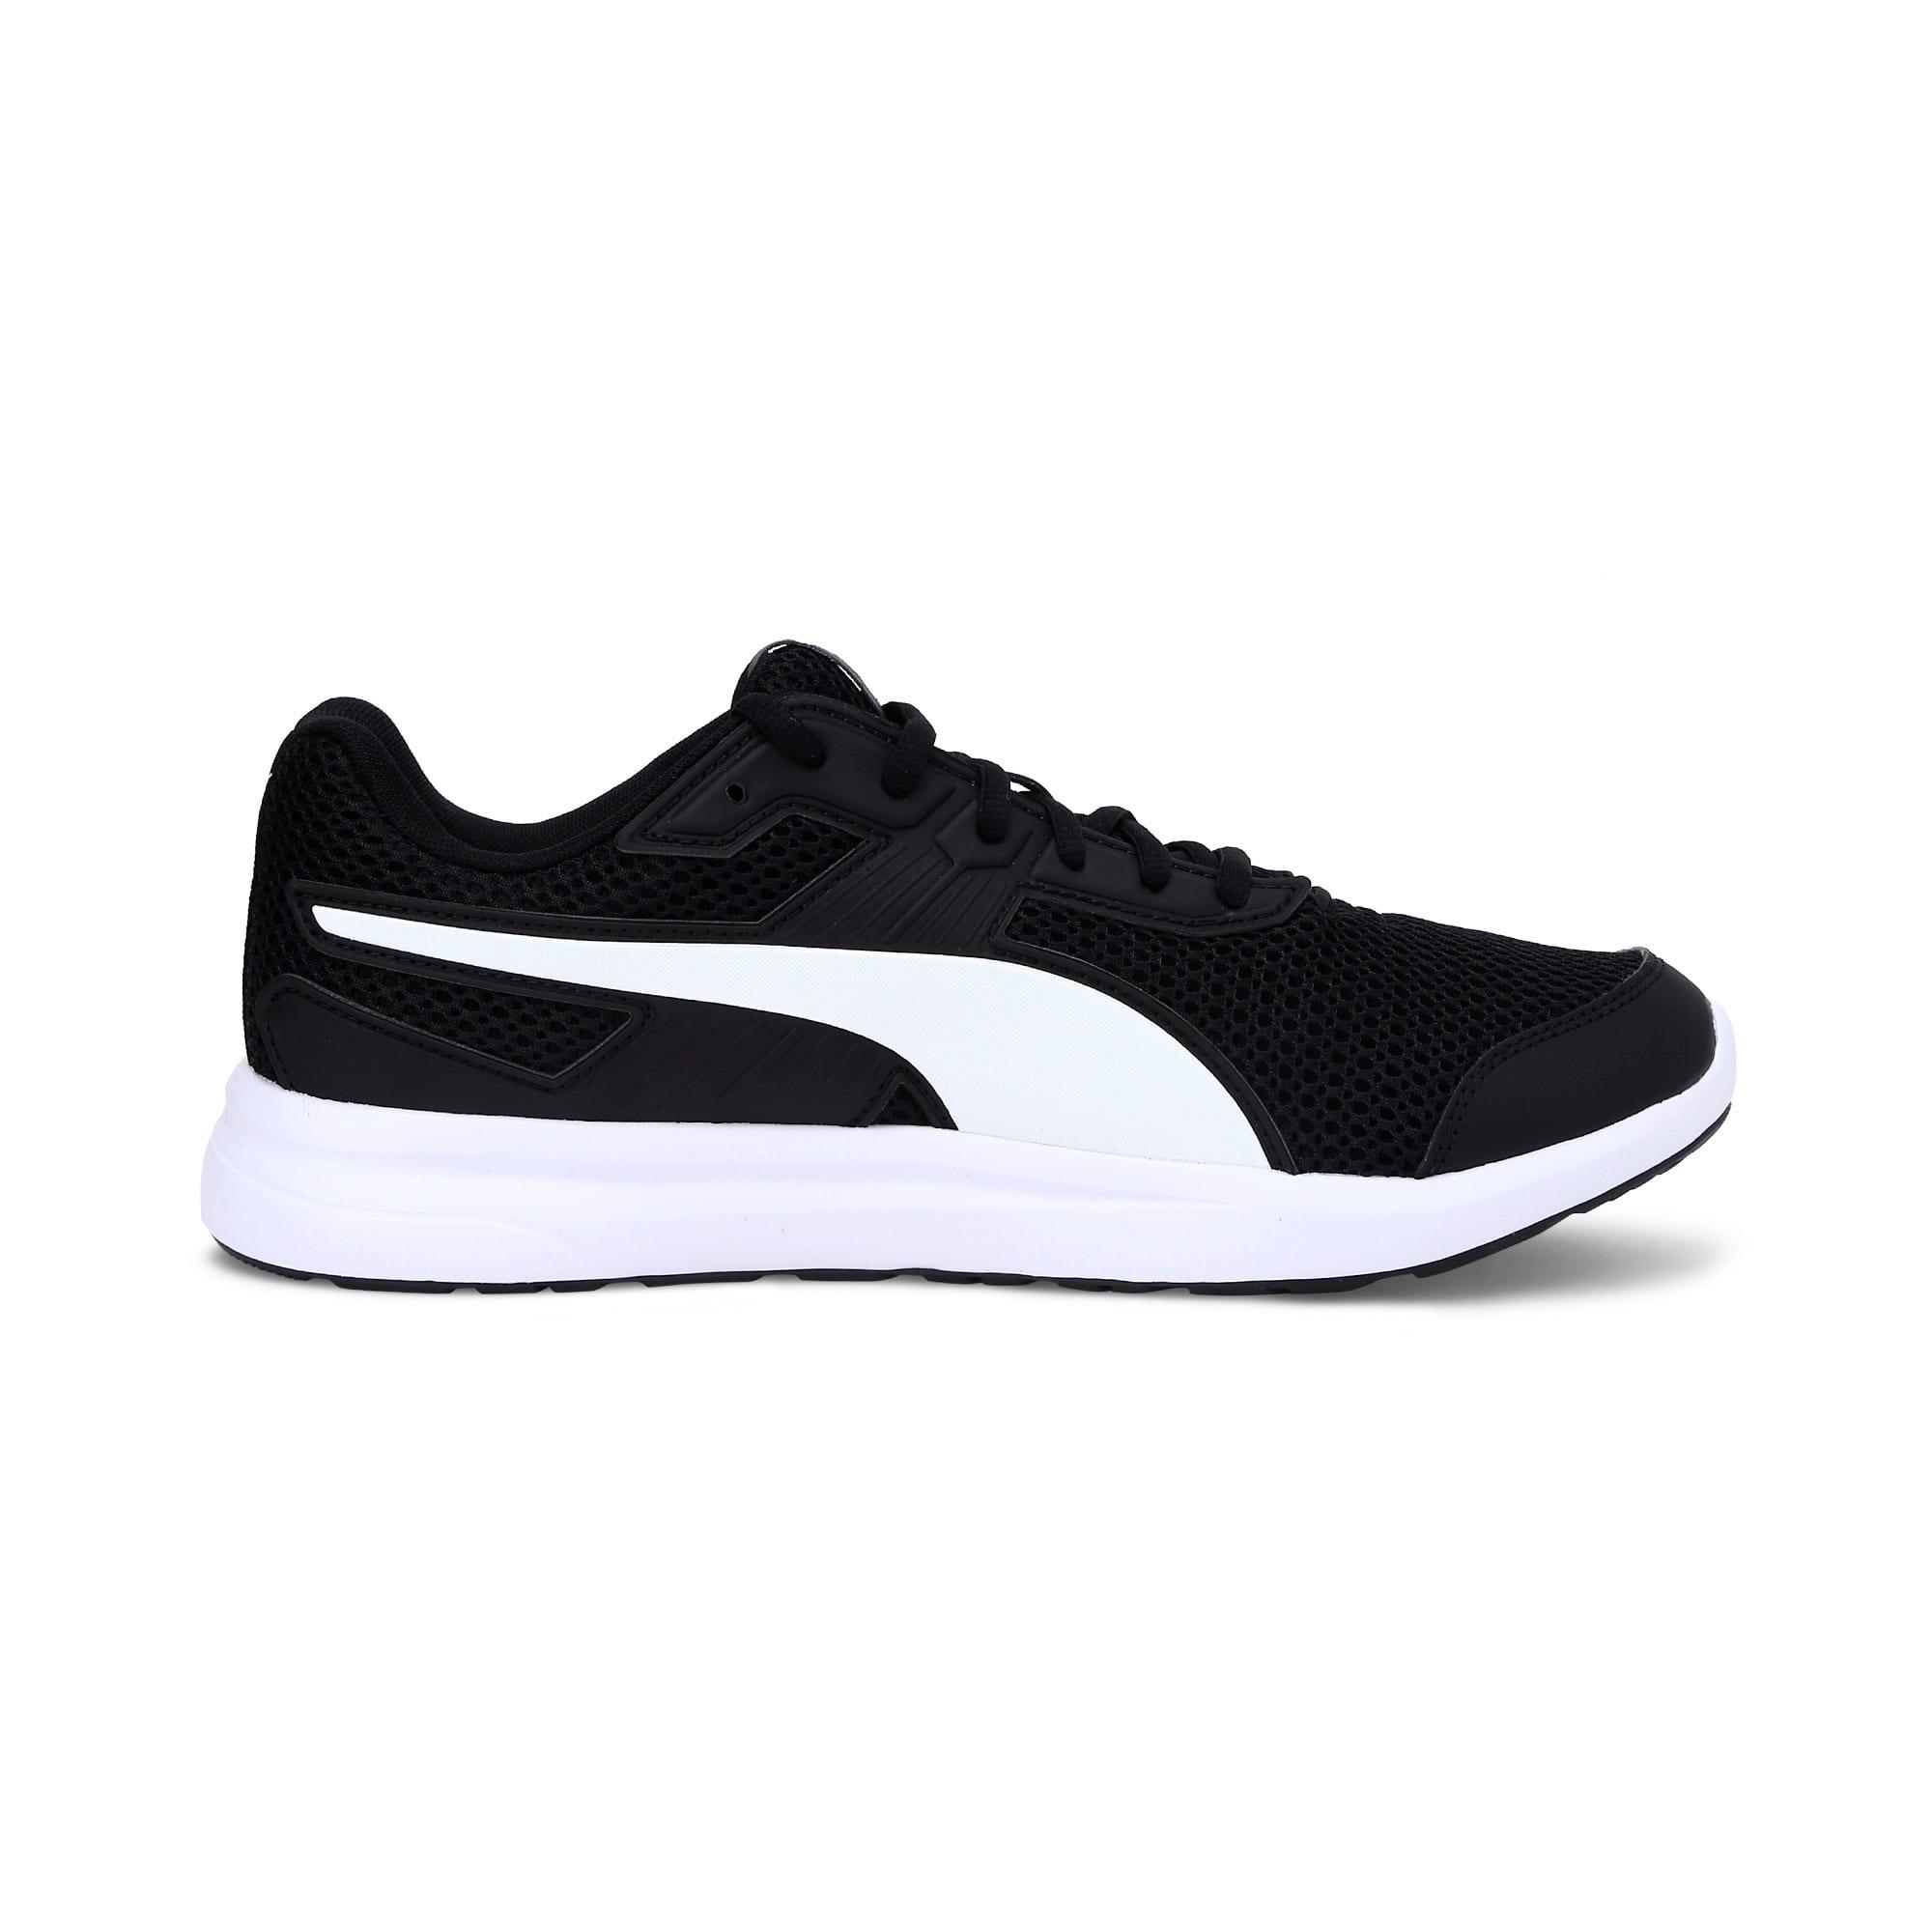 Thumbnail 5 of Escaper Training Shoes, Puma Black-Puma White, medium-IND